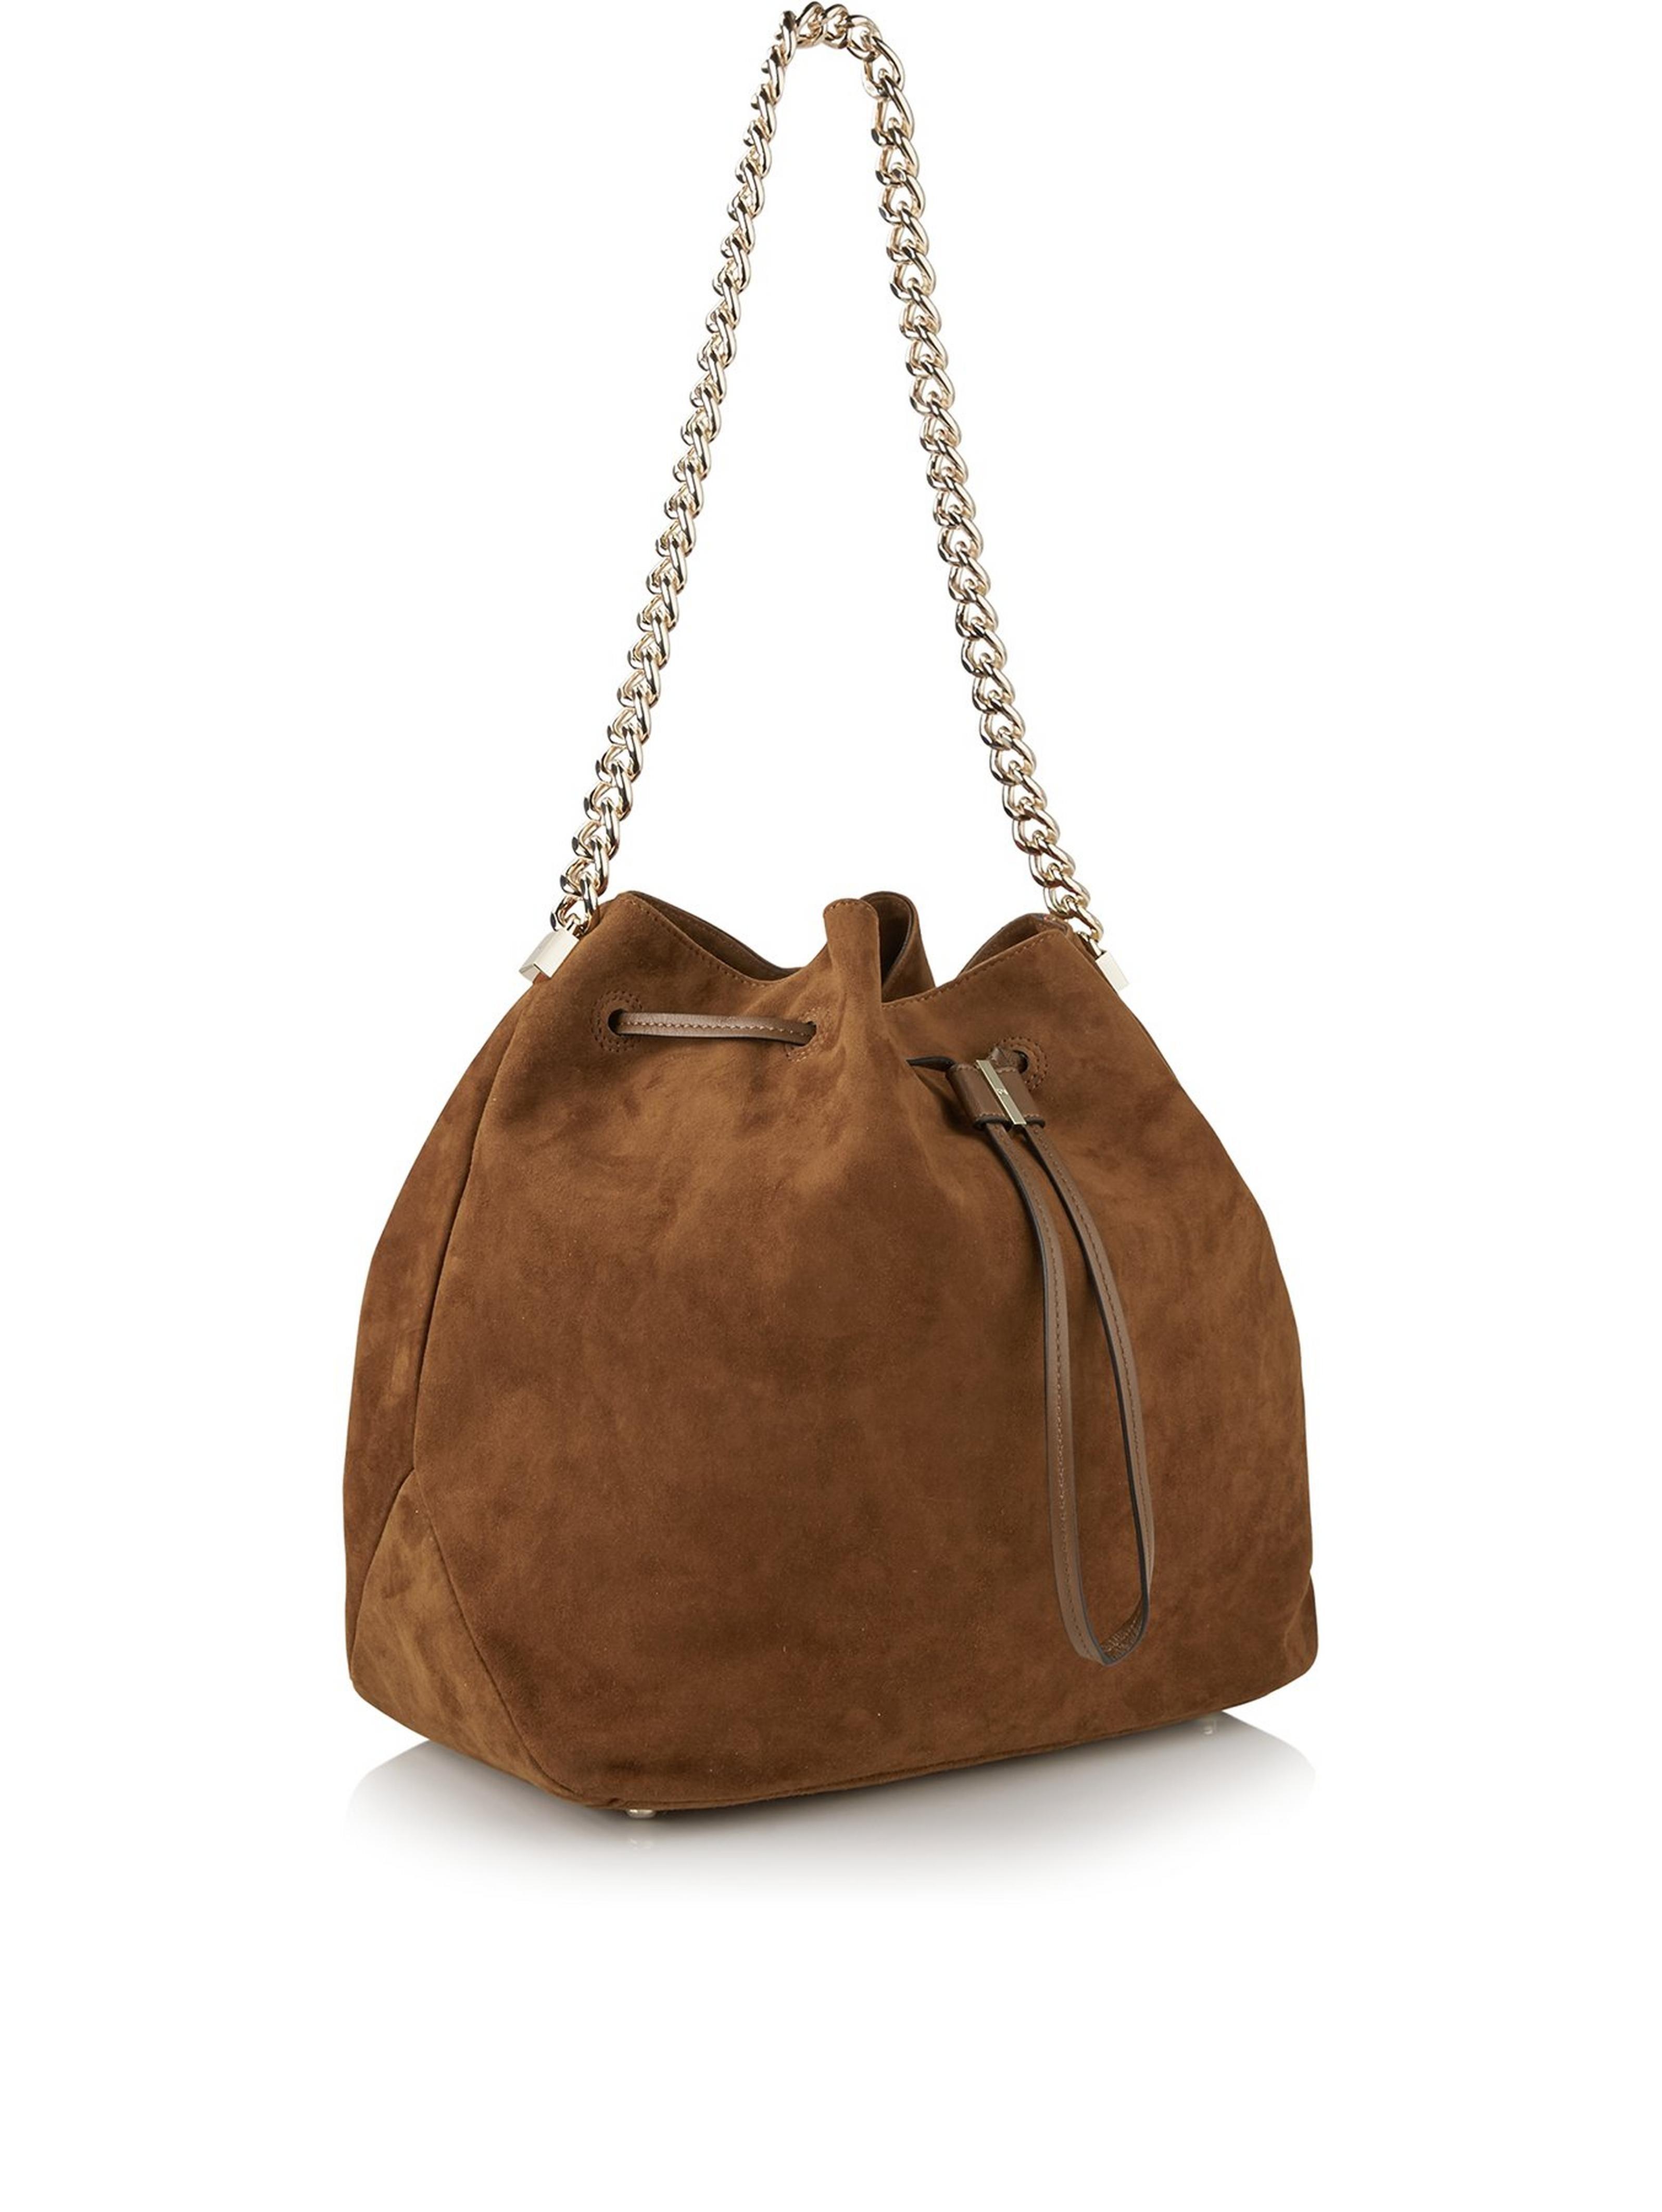 29f6ed9ec84 KAREN MILLEN Suede Drawstring Bucket Bag - TanSize & Fit Dimensions:  Height: 29 cm